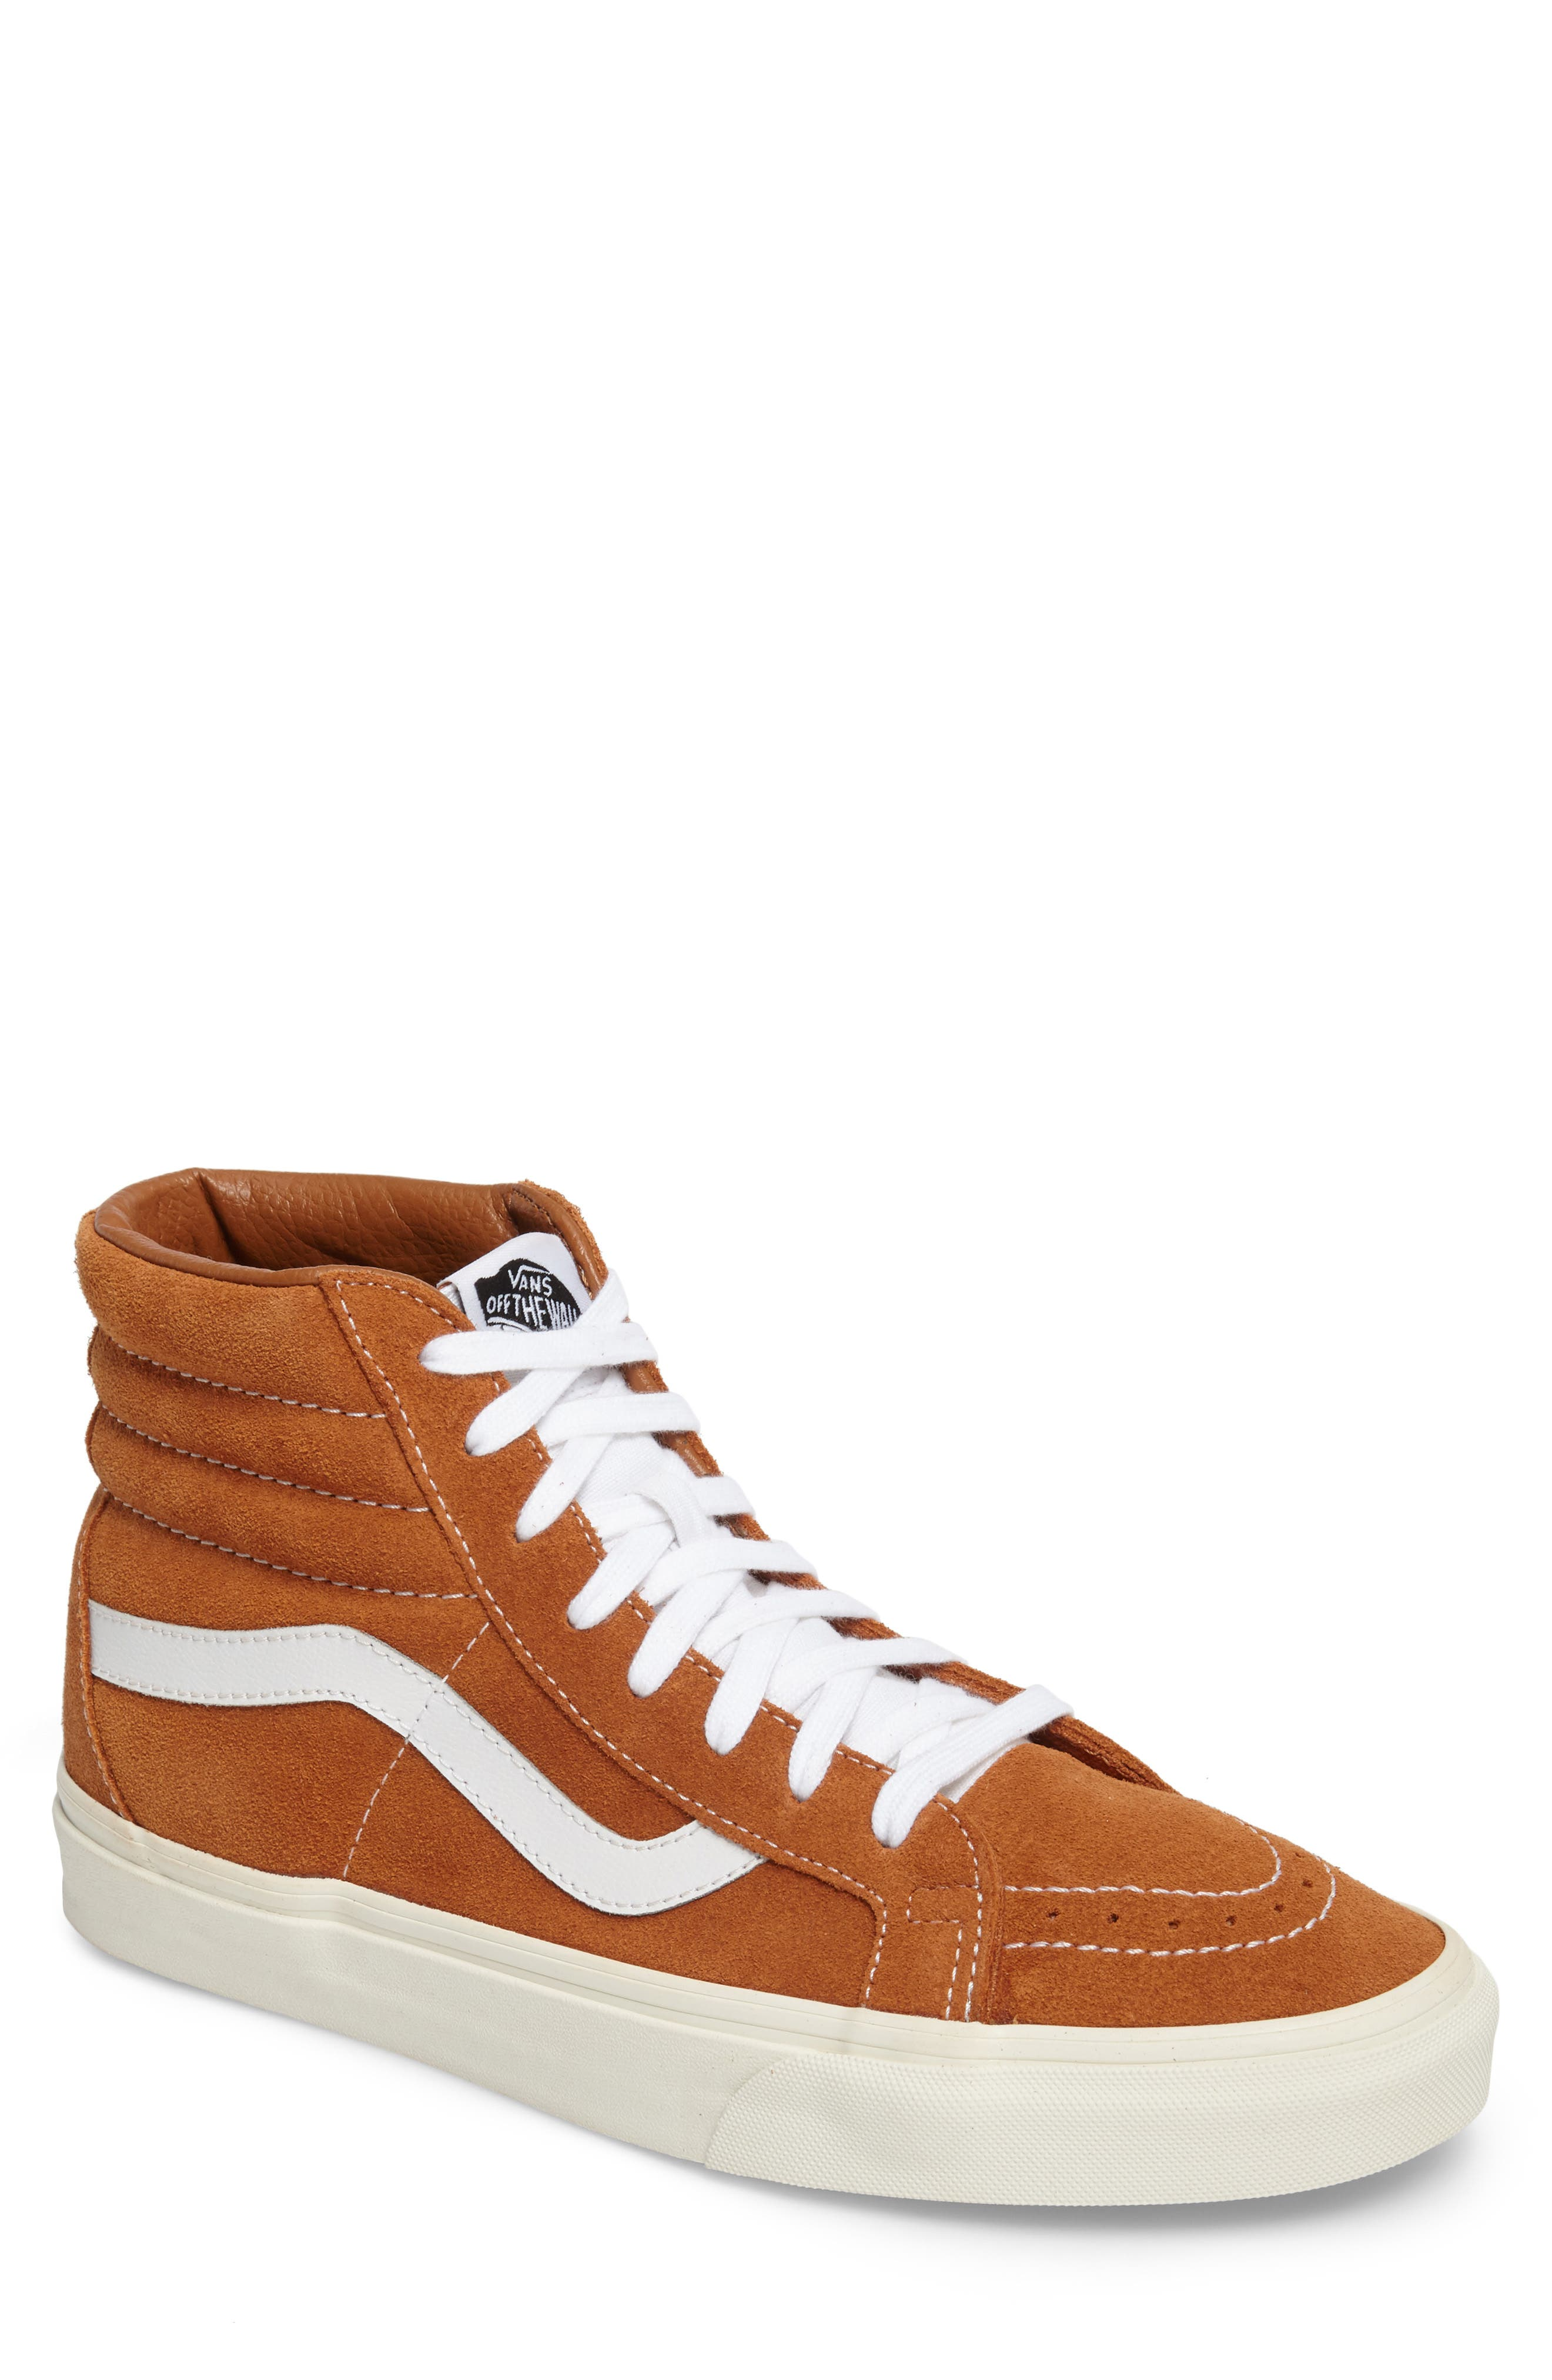 Sk8-Hi Reissue Sneaker,                             Main thumbnail 1, color,                             Glazed Ginger Suede